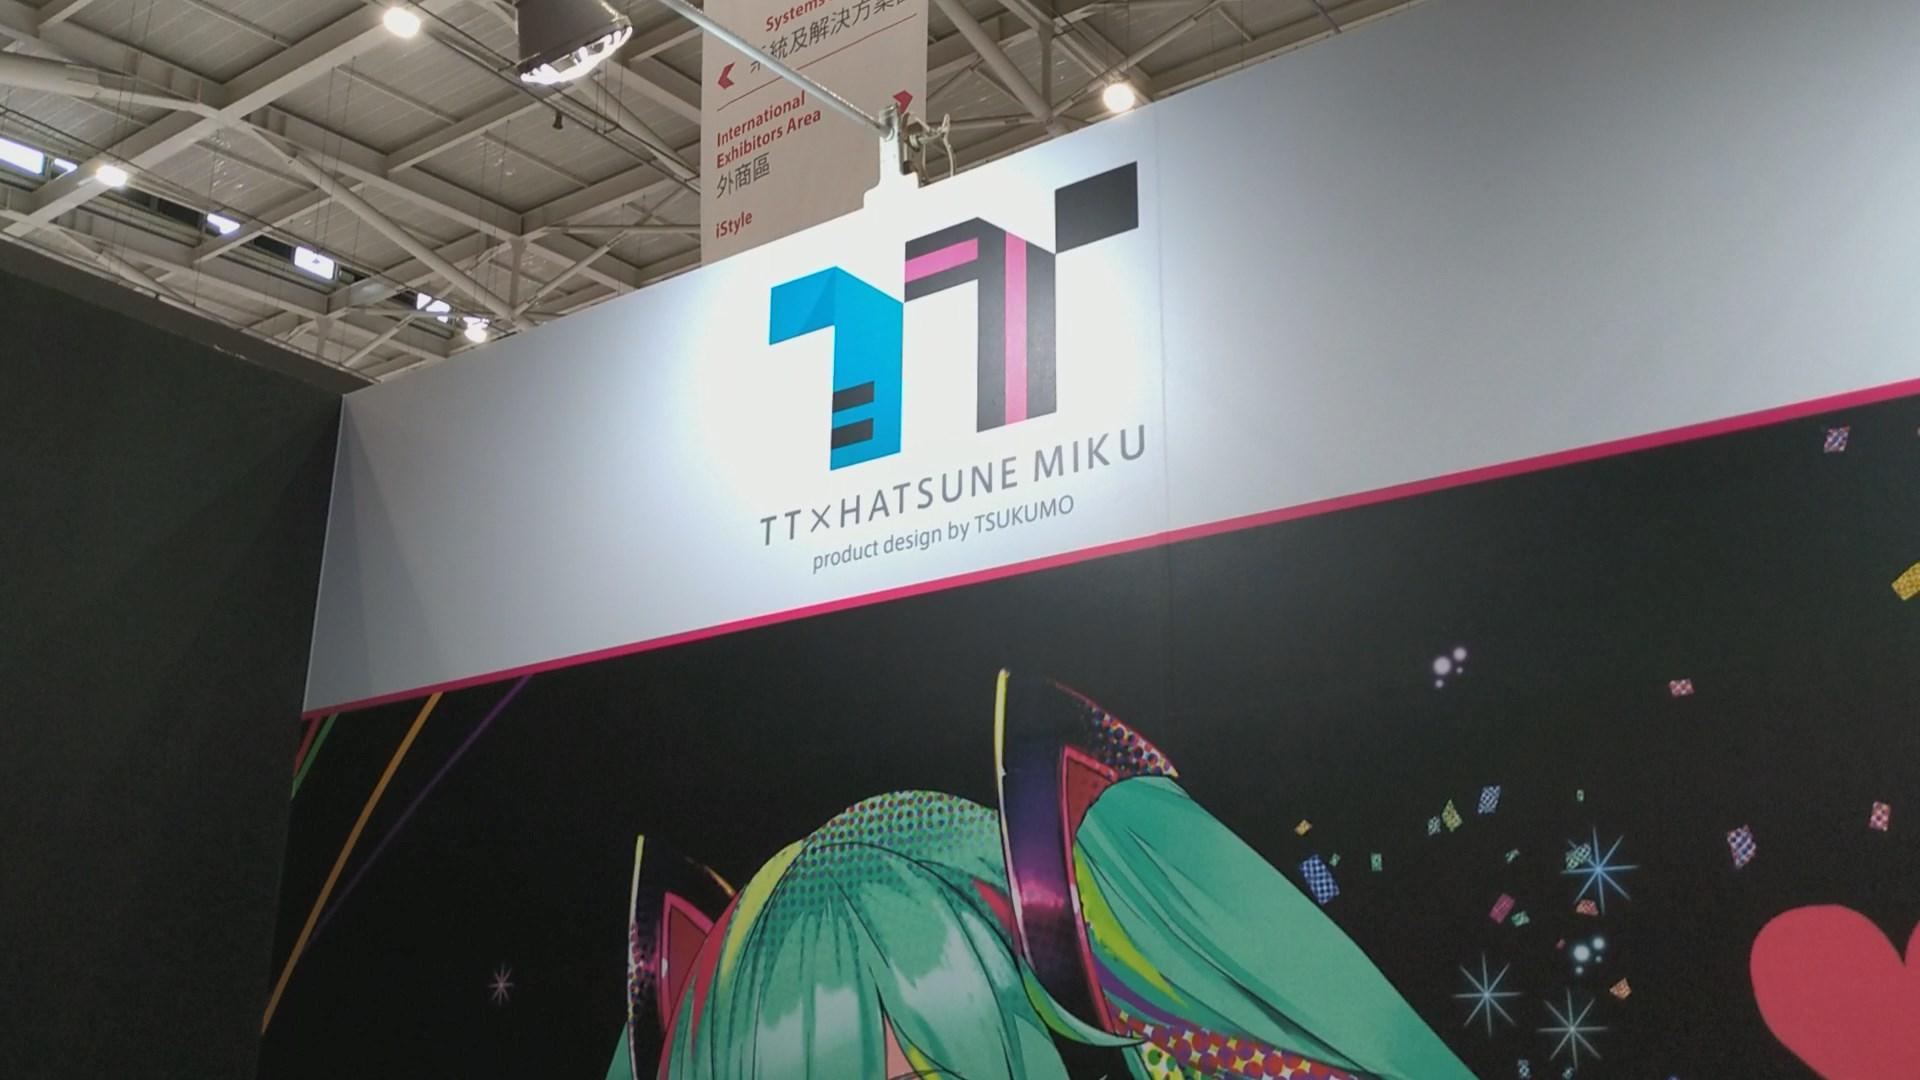 TT x Hatsune Miku - Hatsune Miku themed Thermaltake products at Computex 2019 3